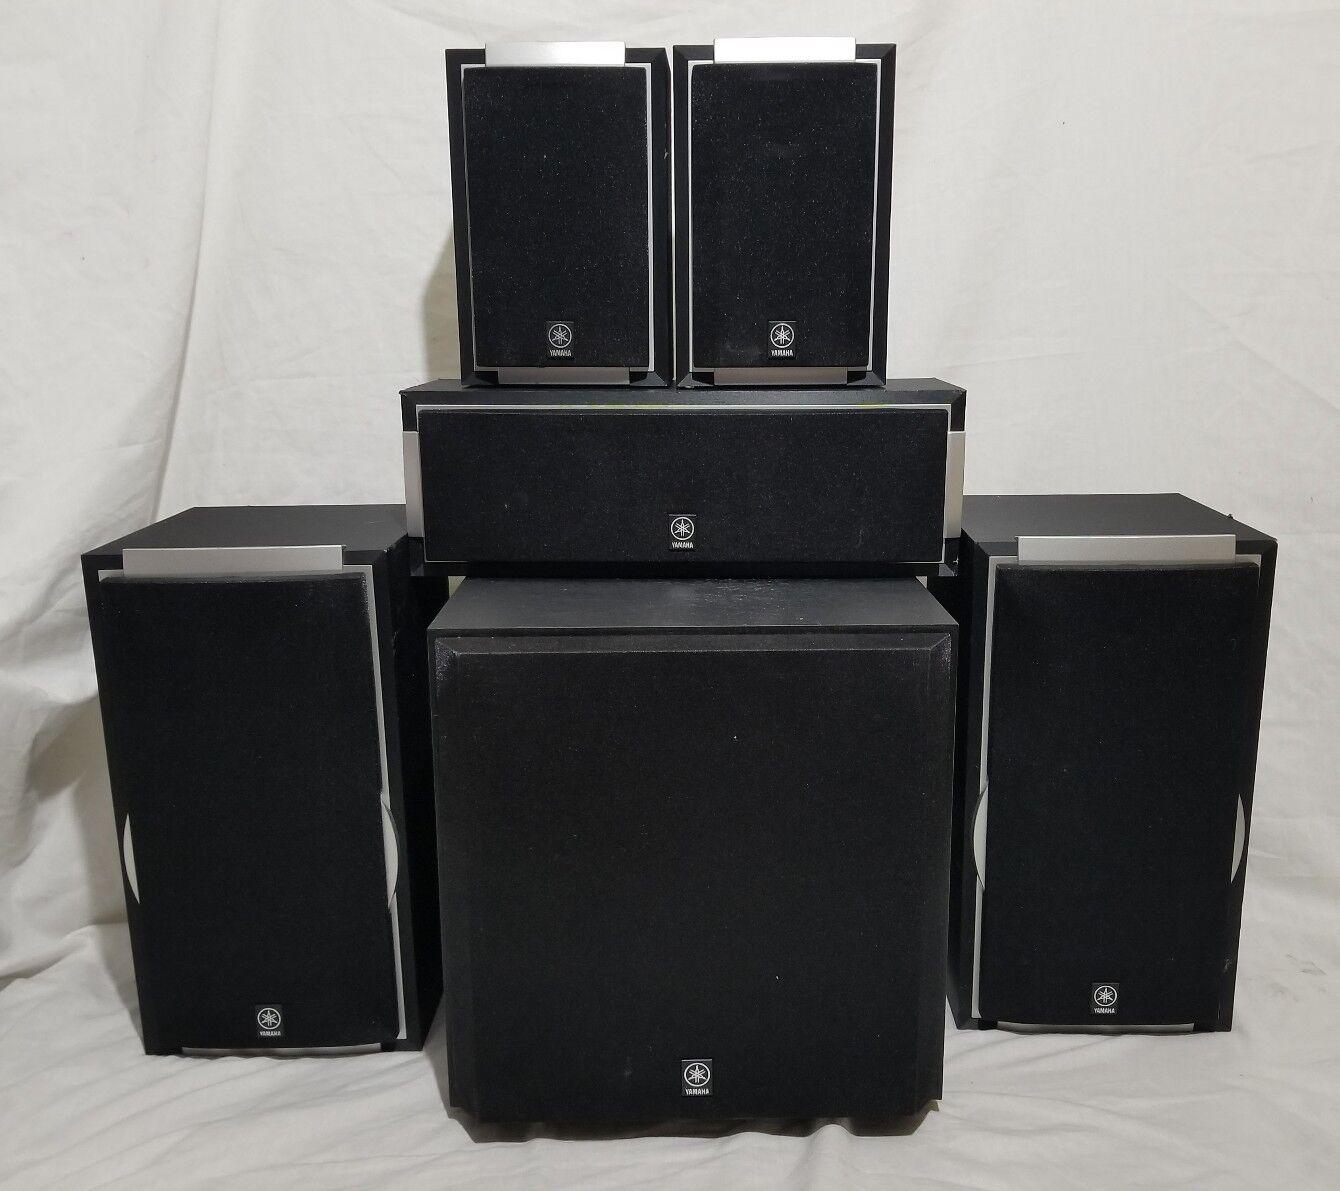 Yamaha SWP3600 NSAP5700 Speaker Bundle 5.1